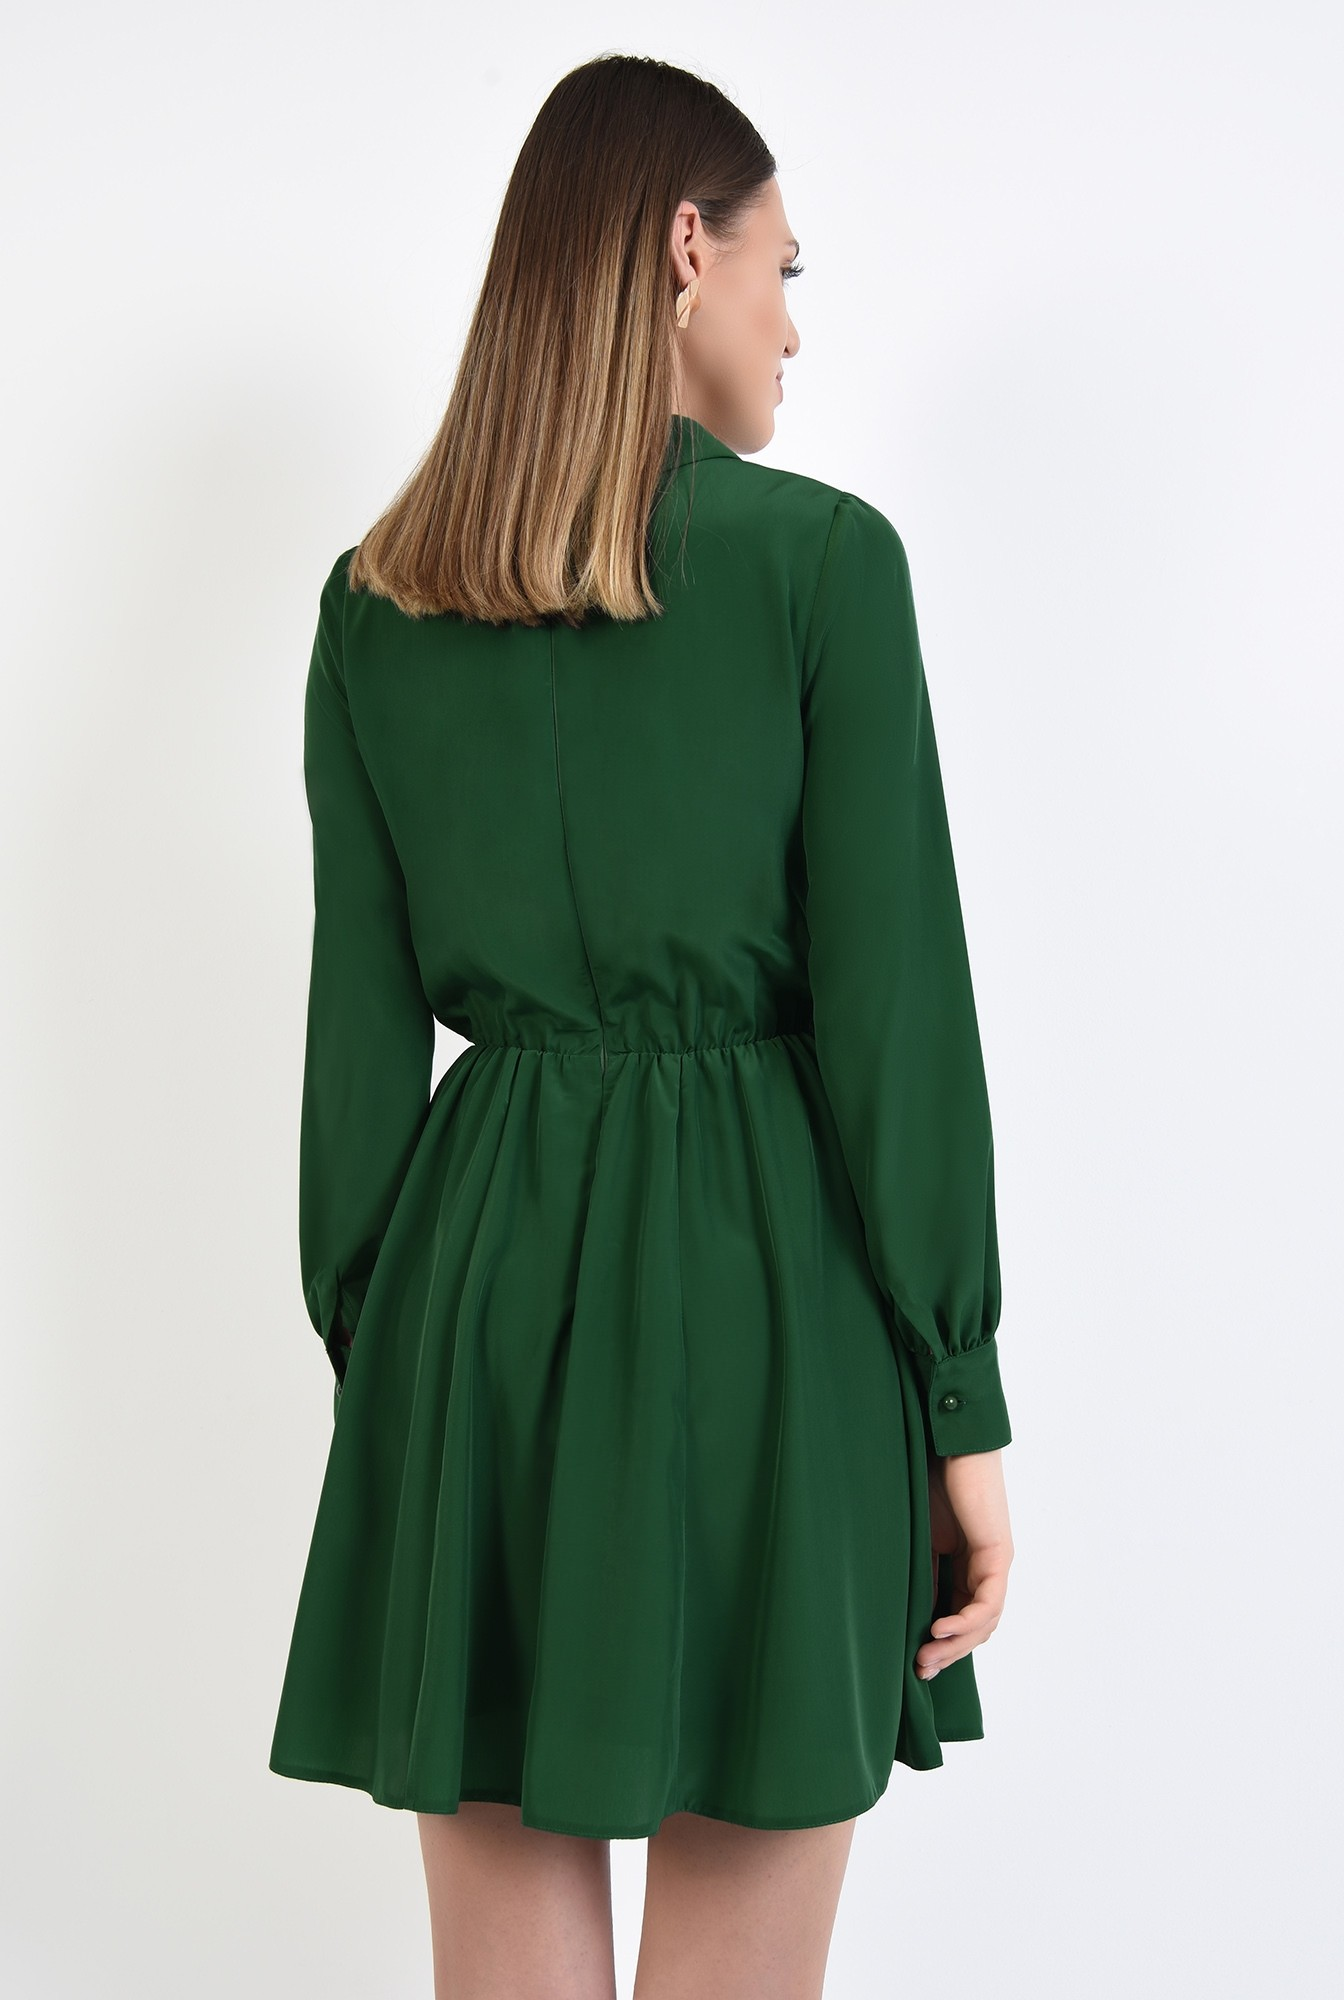 1 - rochie scurta, evazata, clos, talie pe elastic, guler